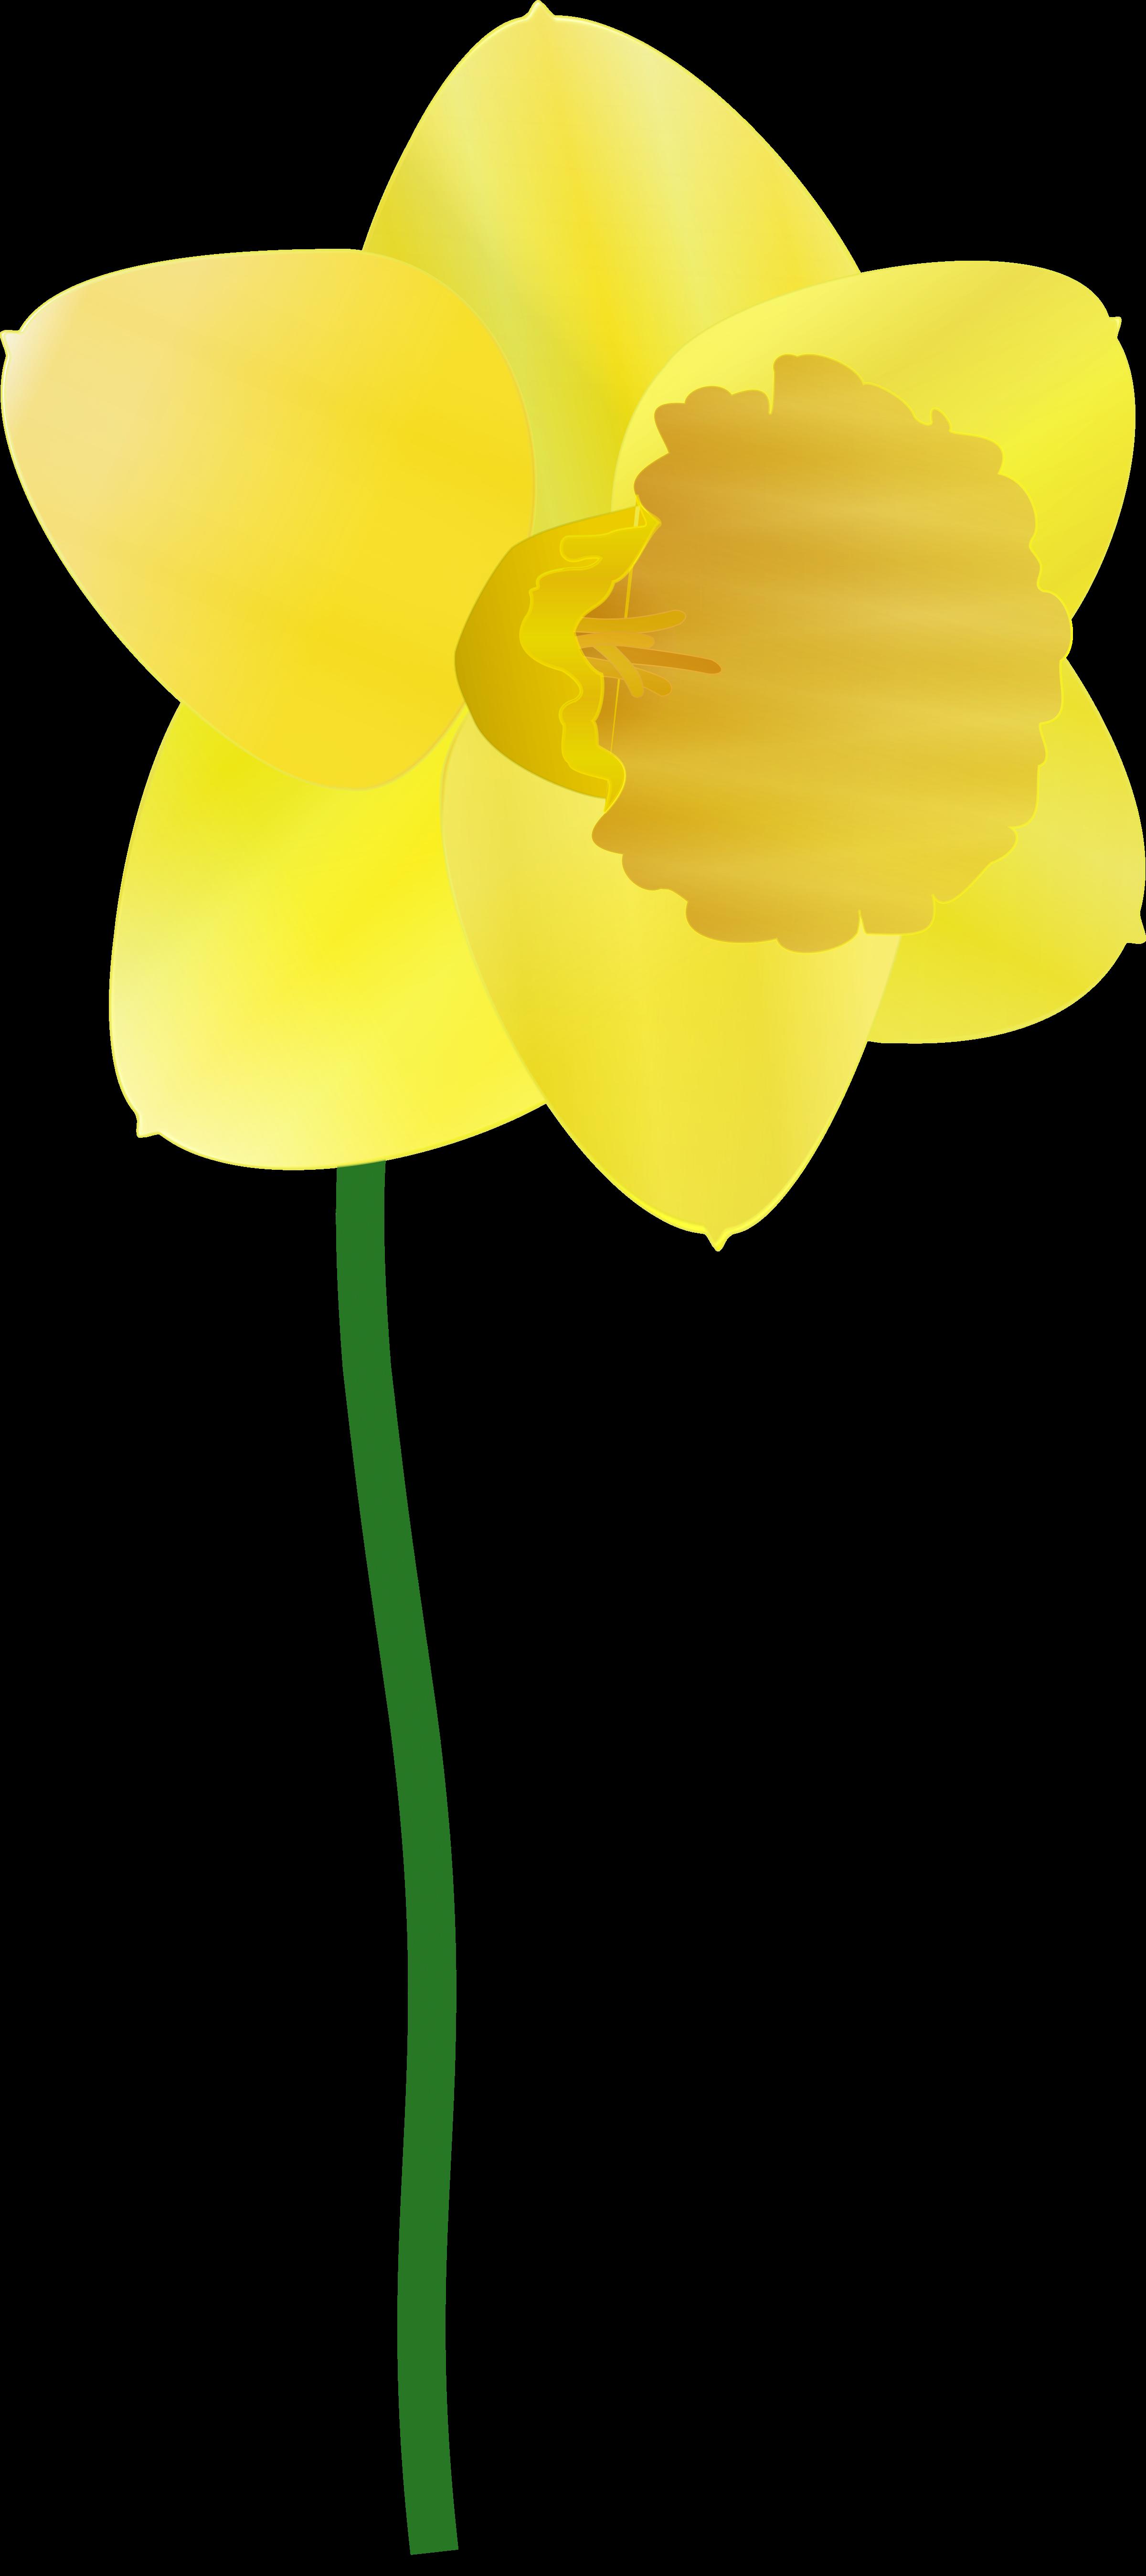 Daffodil flower clipart jpg black and white download Clipart - daffodil jpg black and white download